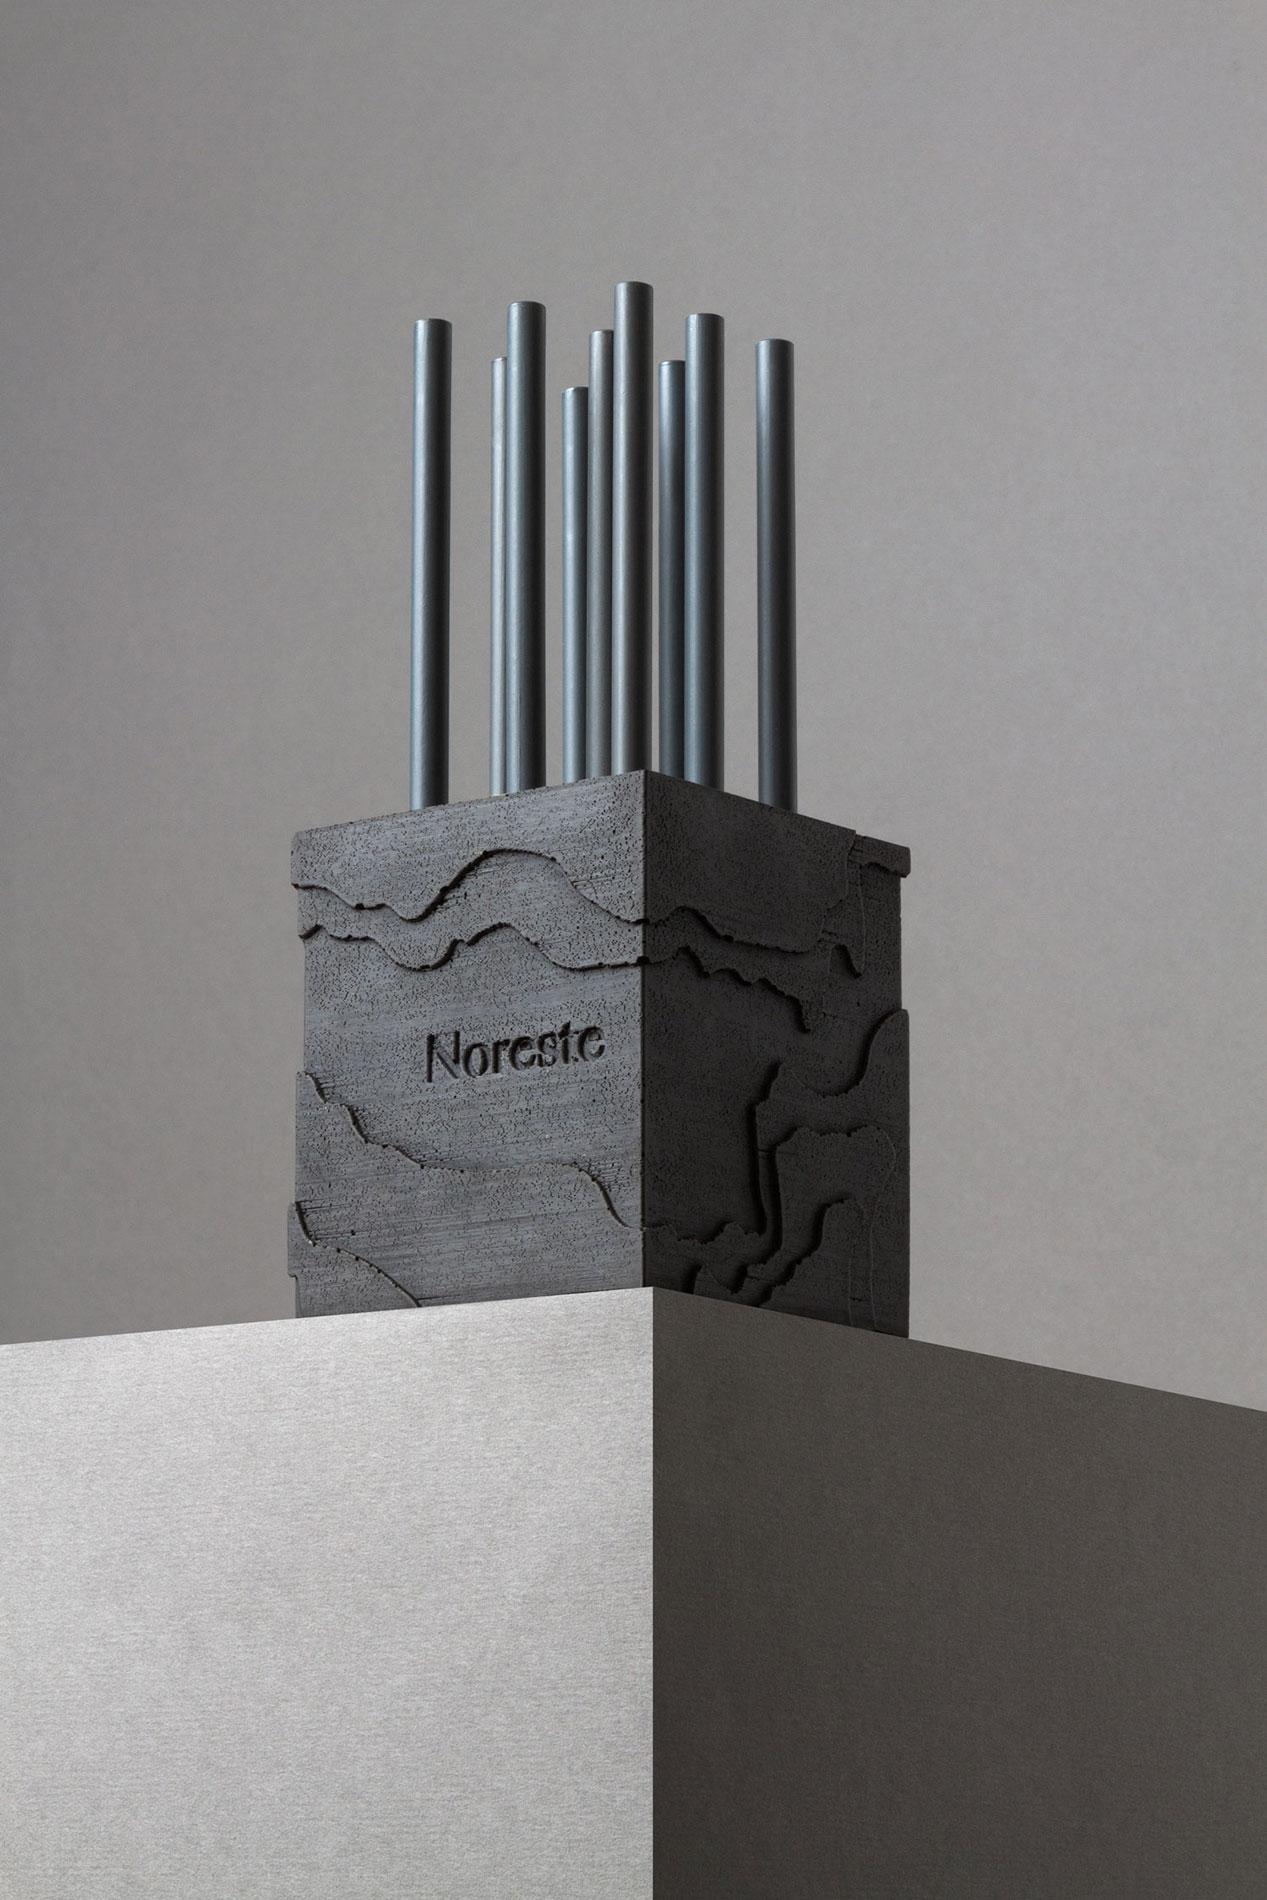 Lapicero cemento cuadrado Noreste studio